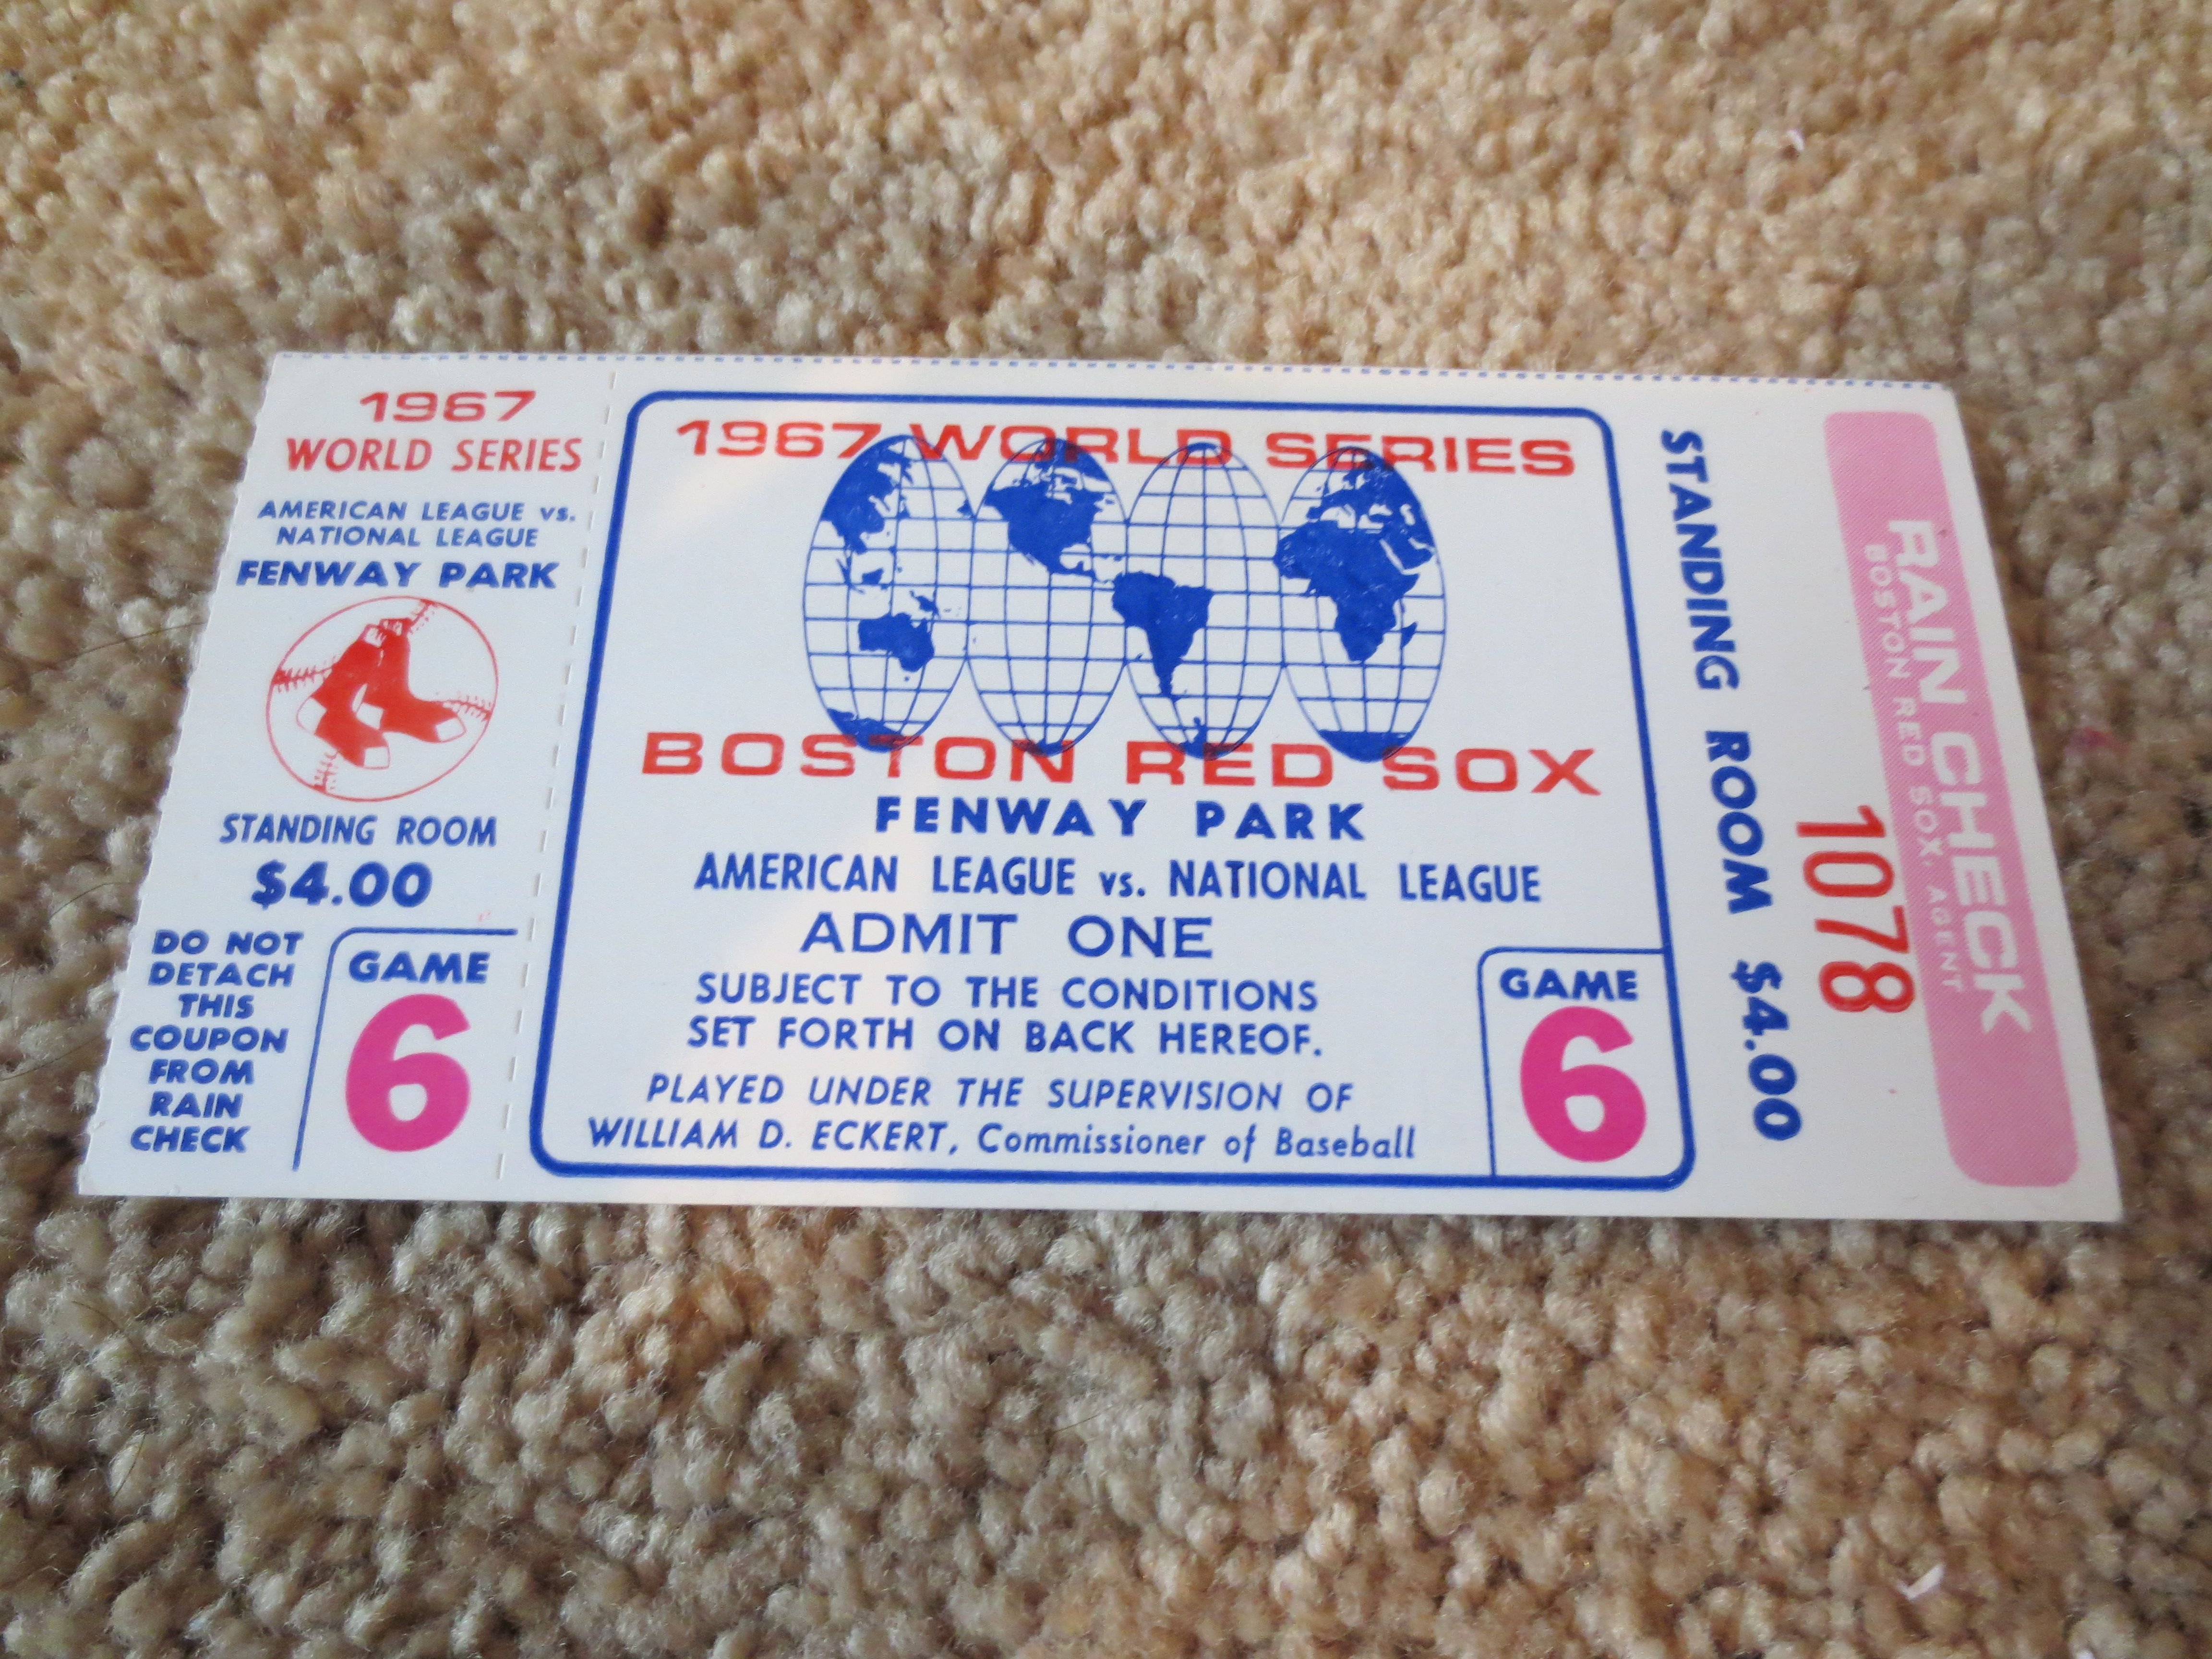 1967 World Series Game 6 Ticket Boston Red Sox St Louis Cardinals Fenway Park Yaz